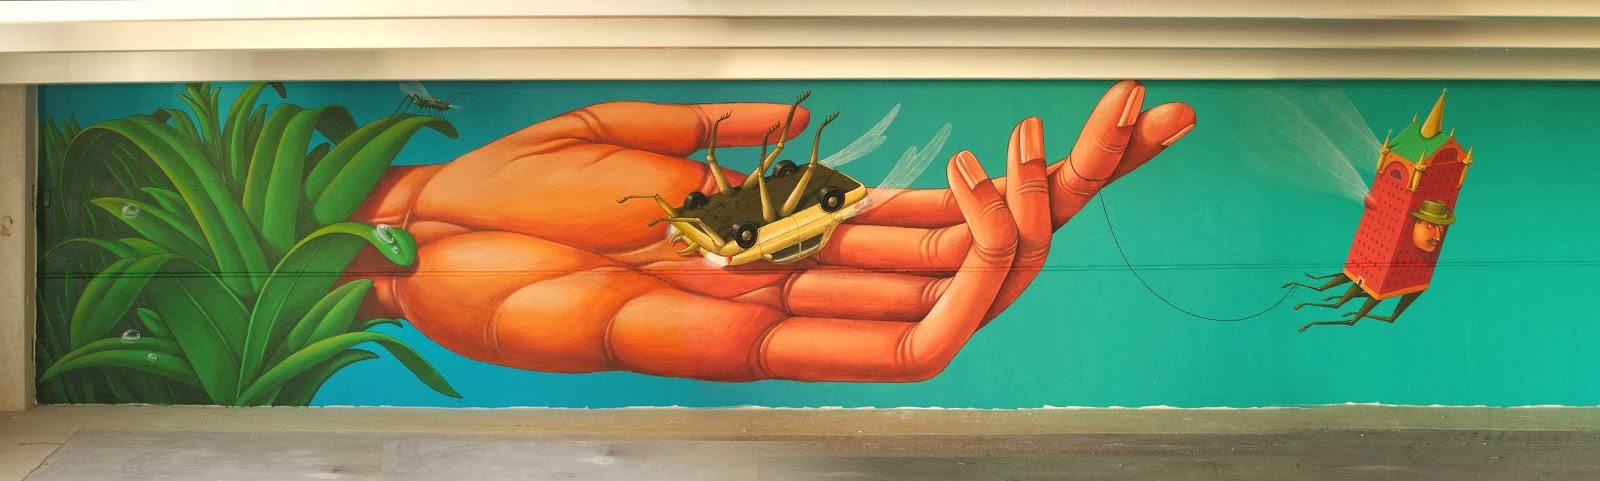 interesni-kazki-new-mural-library-street-collective-01